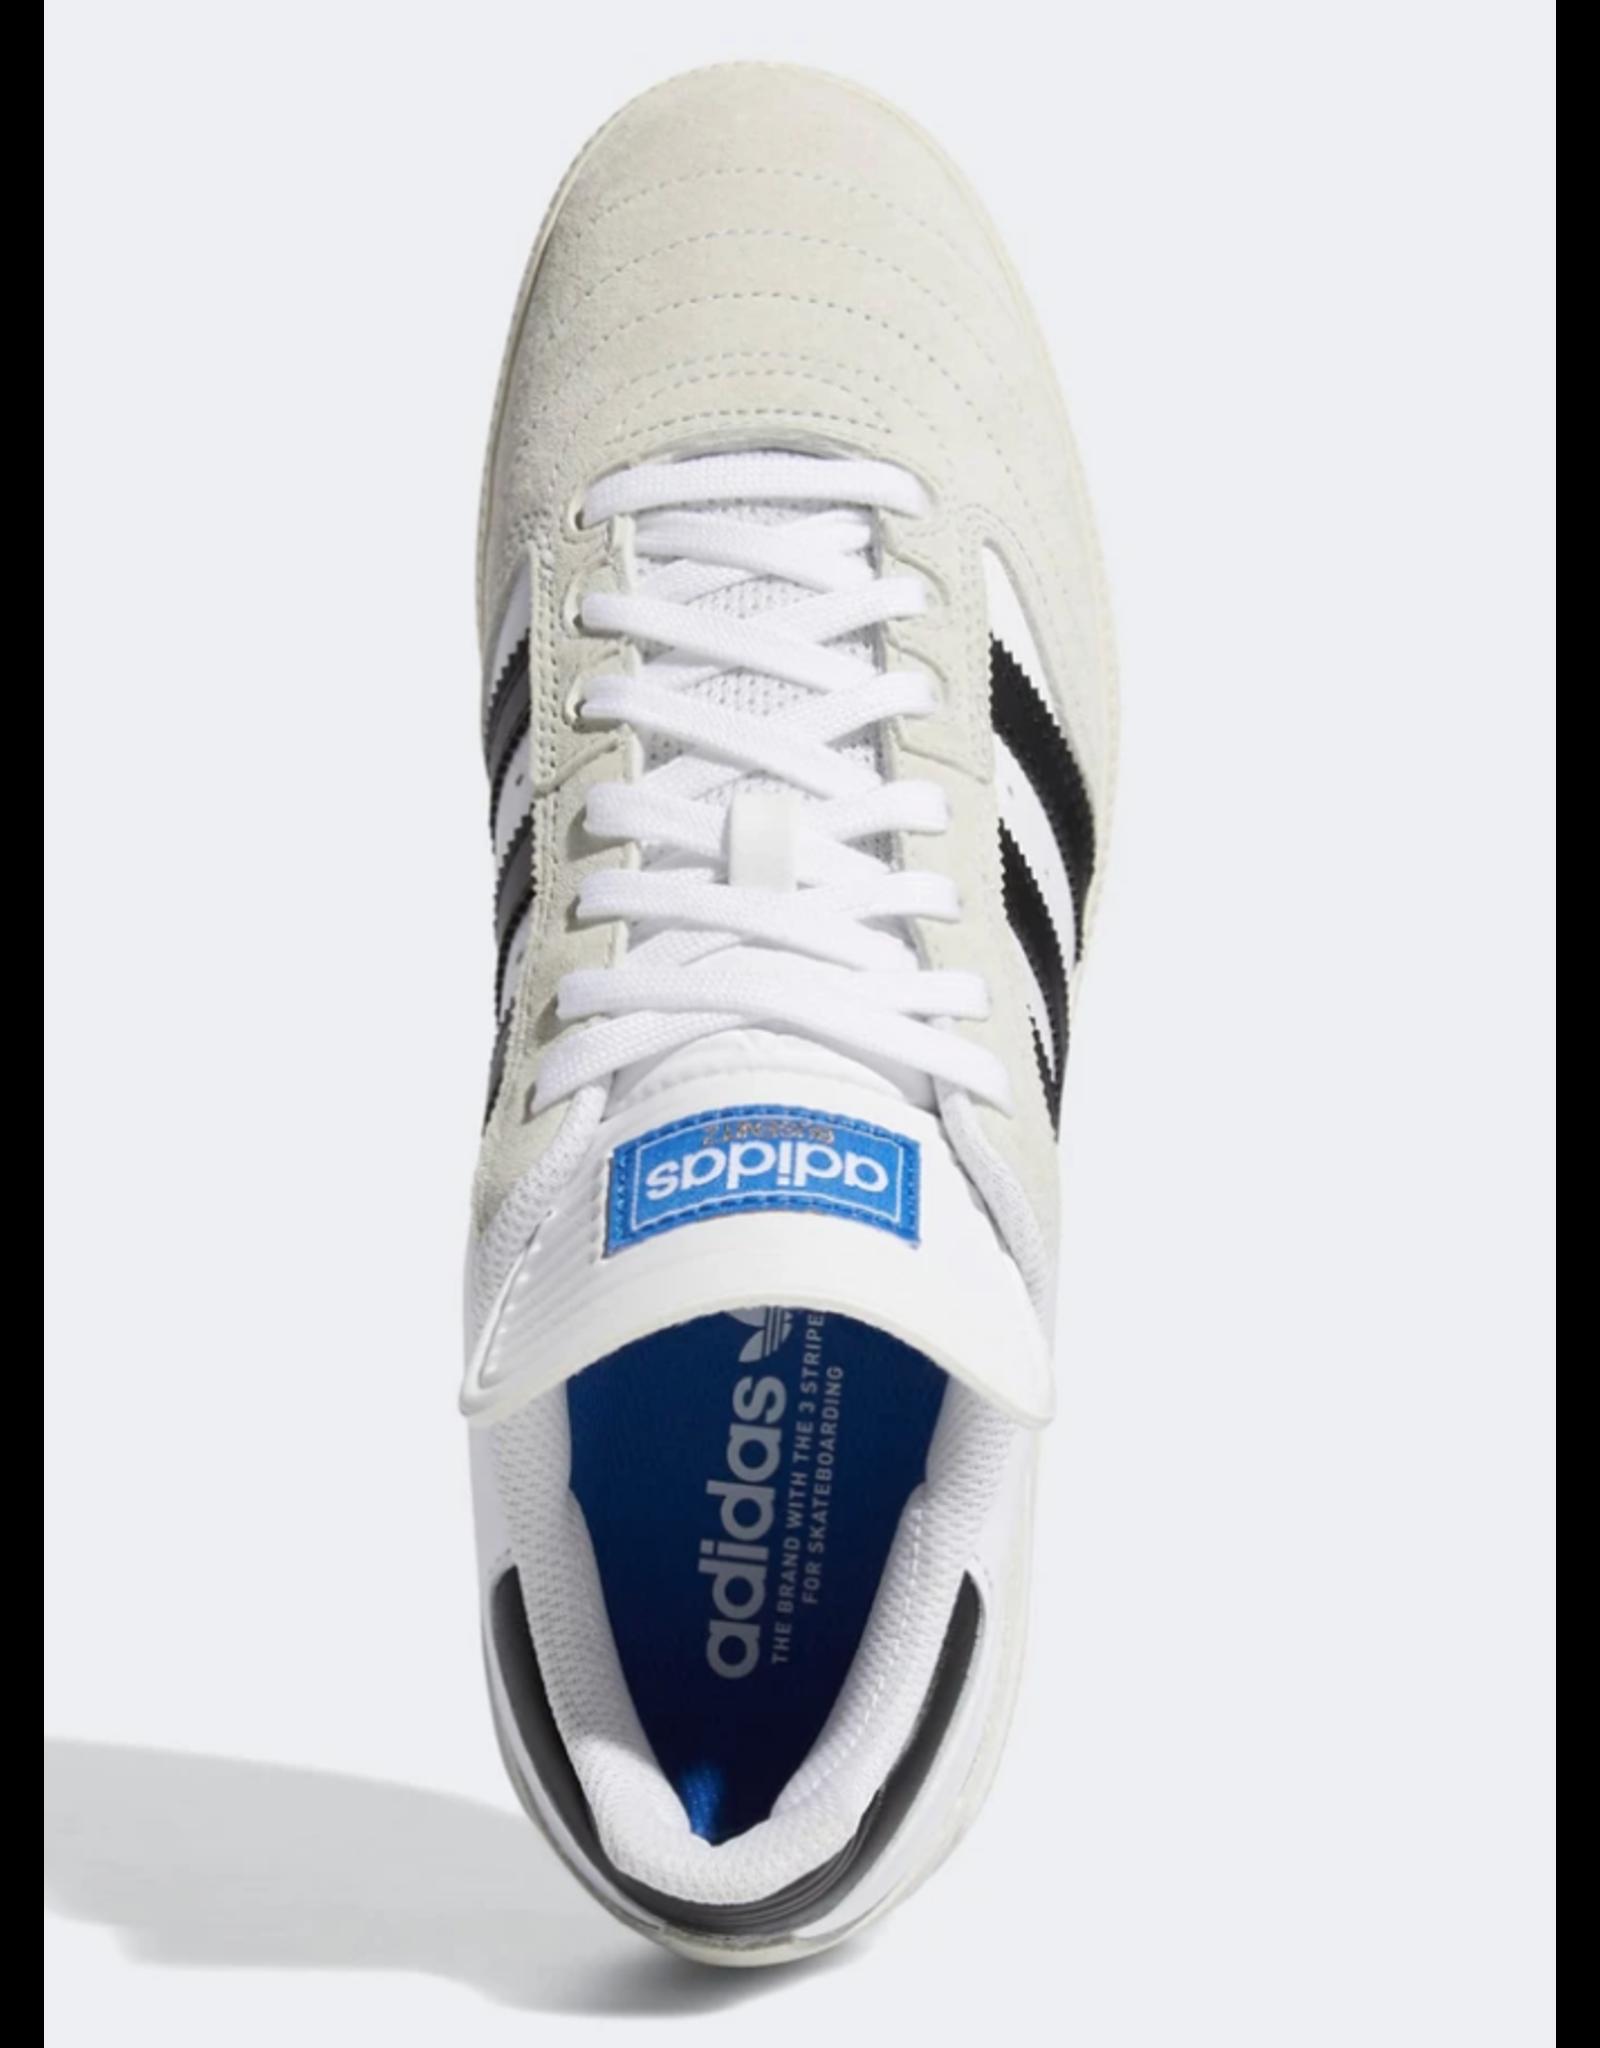 Adidas Busenitz - Cloud White